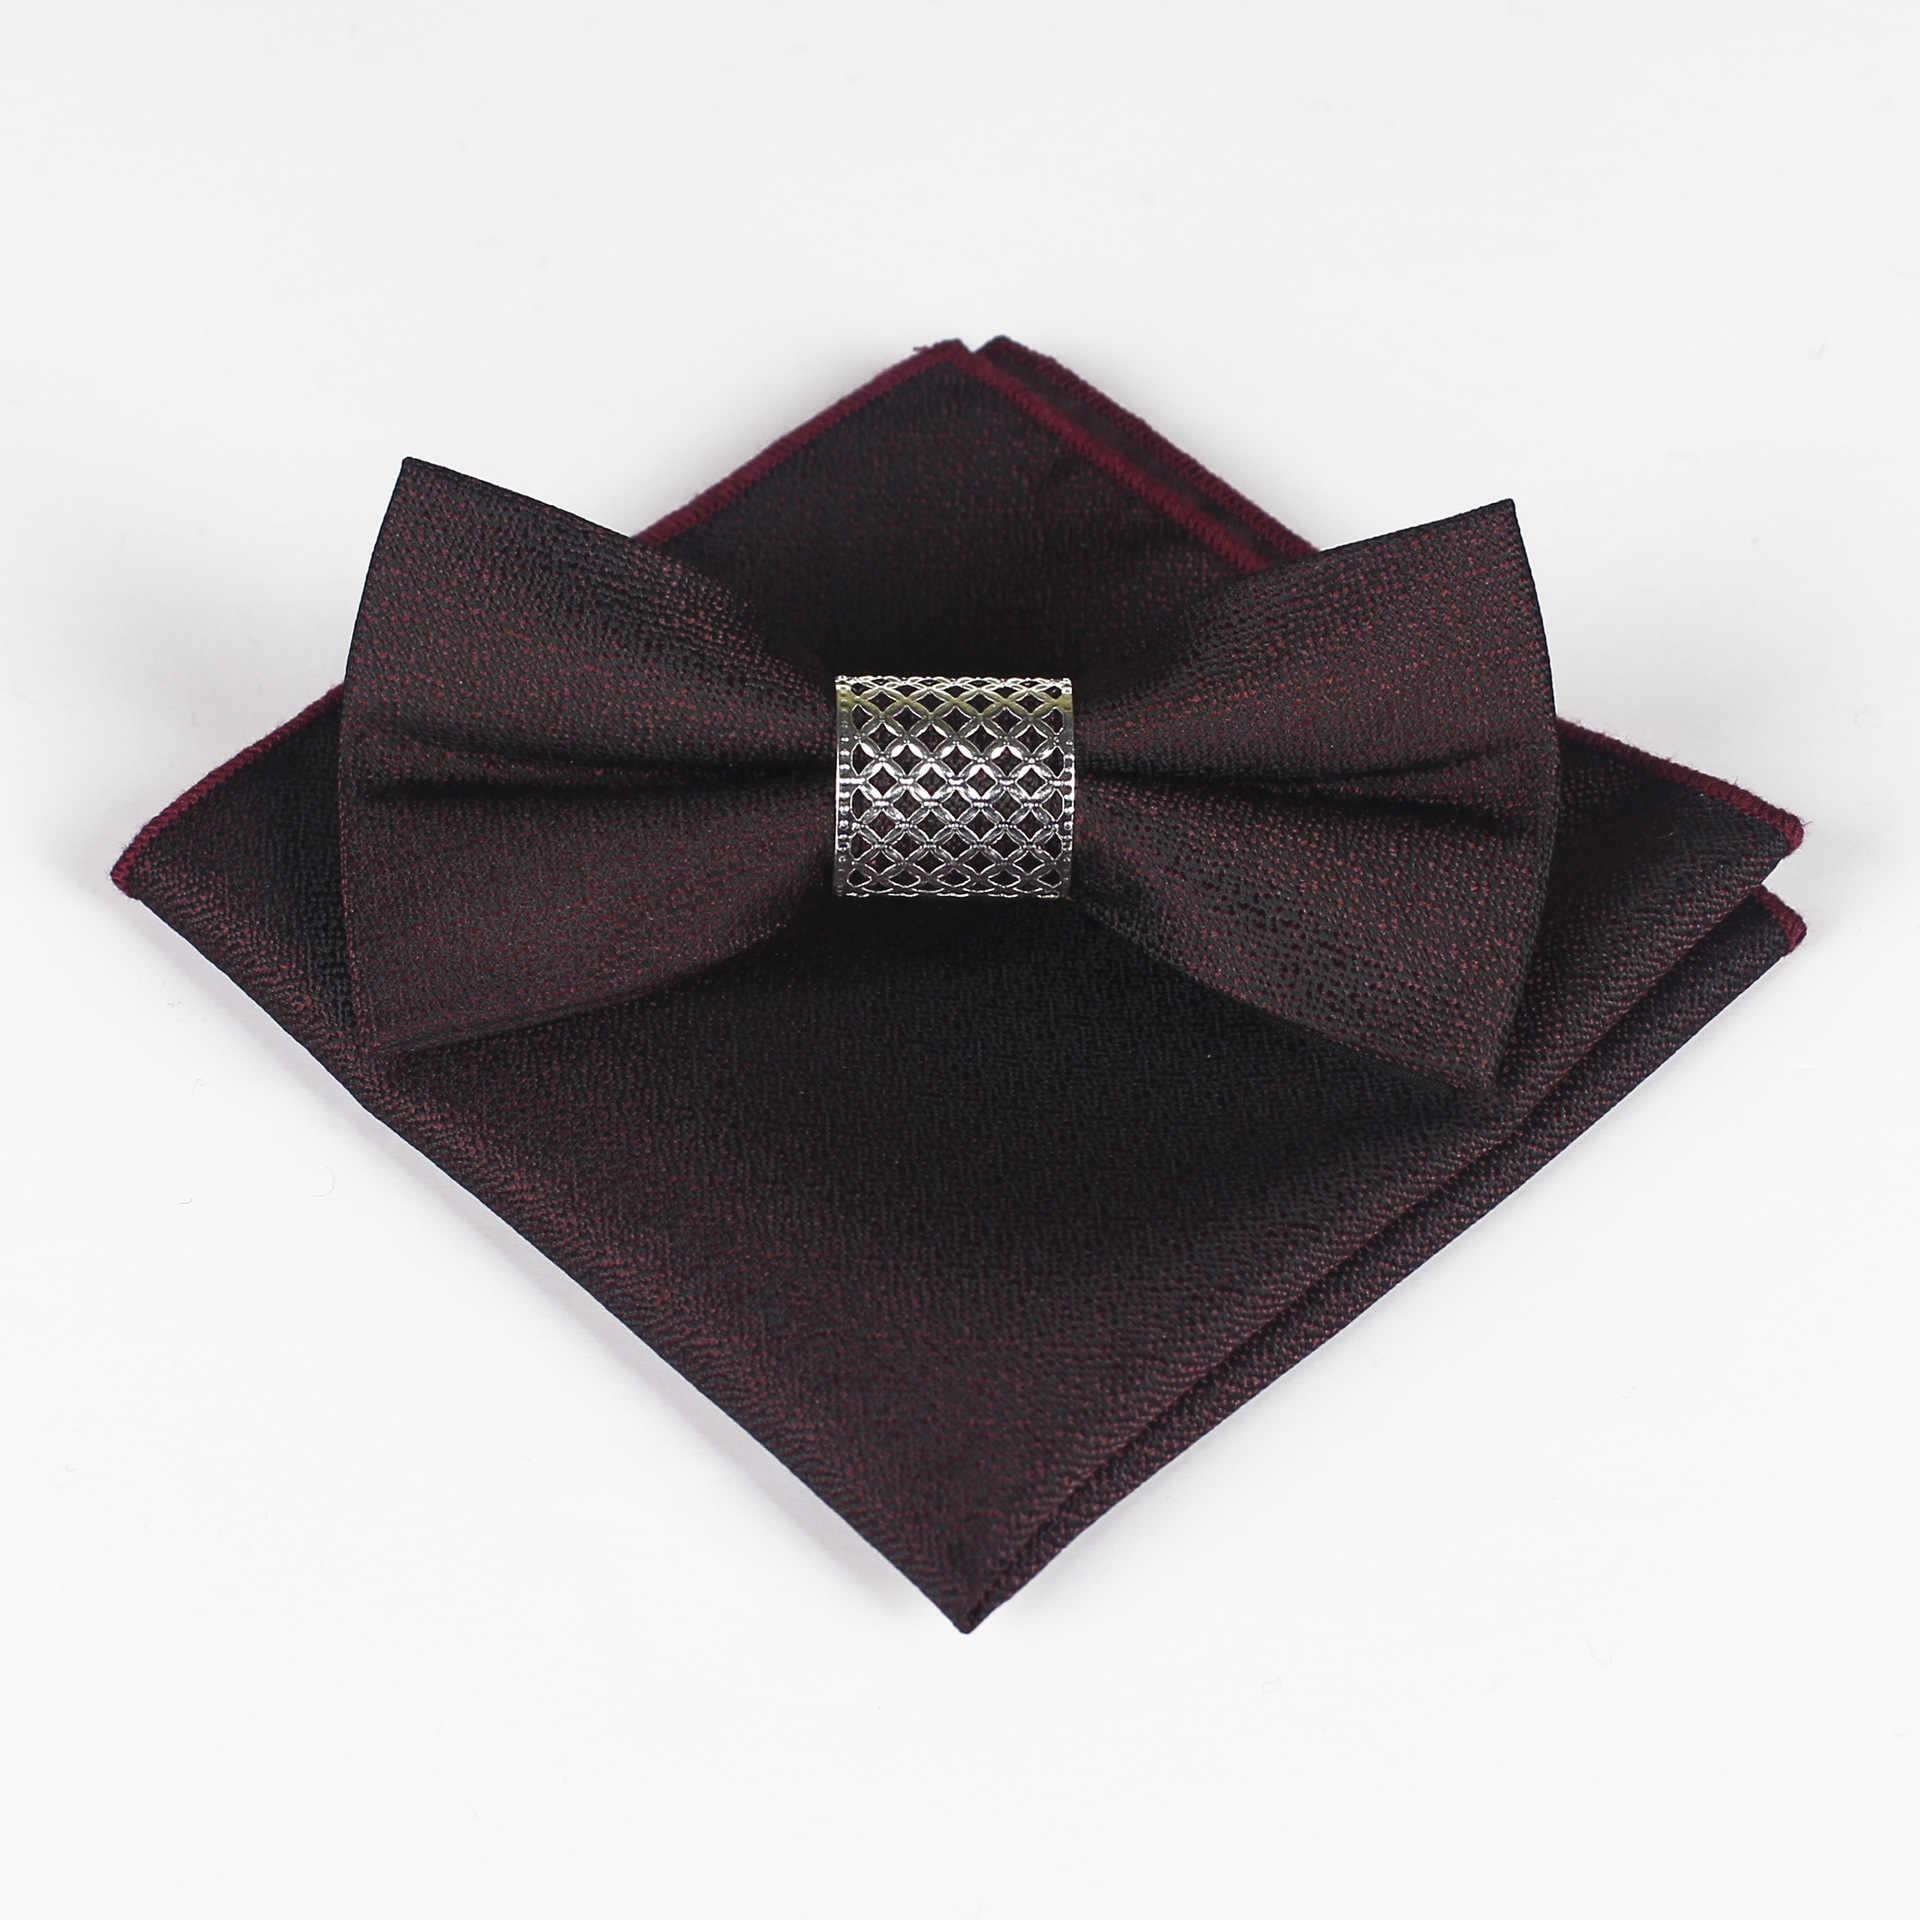 Mantieqingway галстук бабочка 2019 Горячий тренд набор металлический сердечник